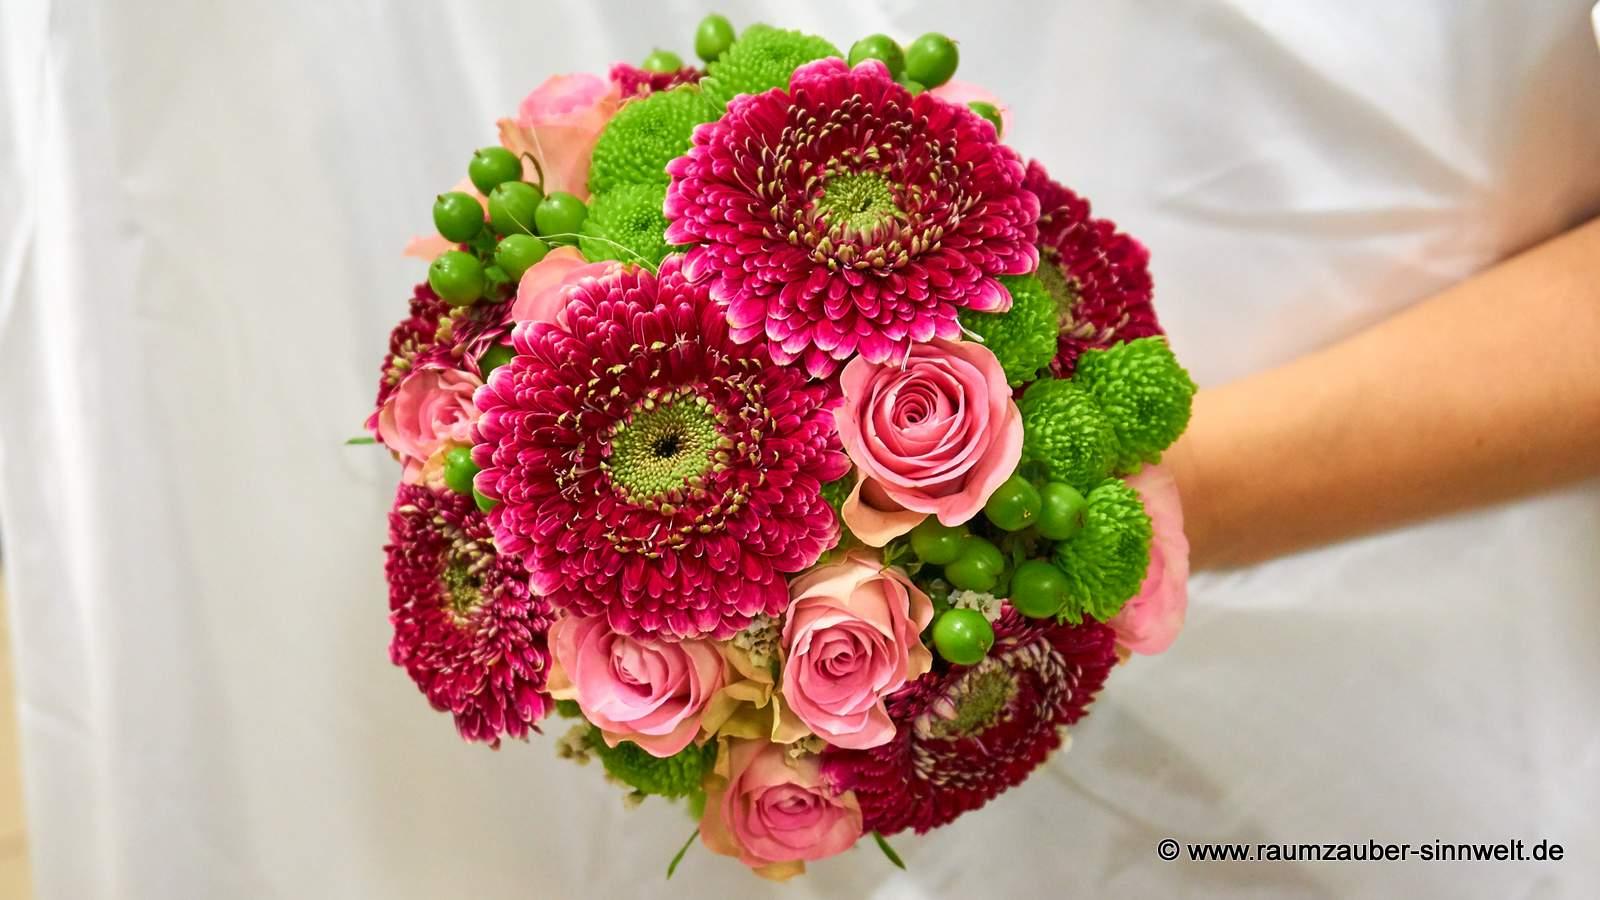 Brautstrauß mit Rosen, Gerbera und Santini